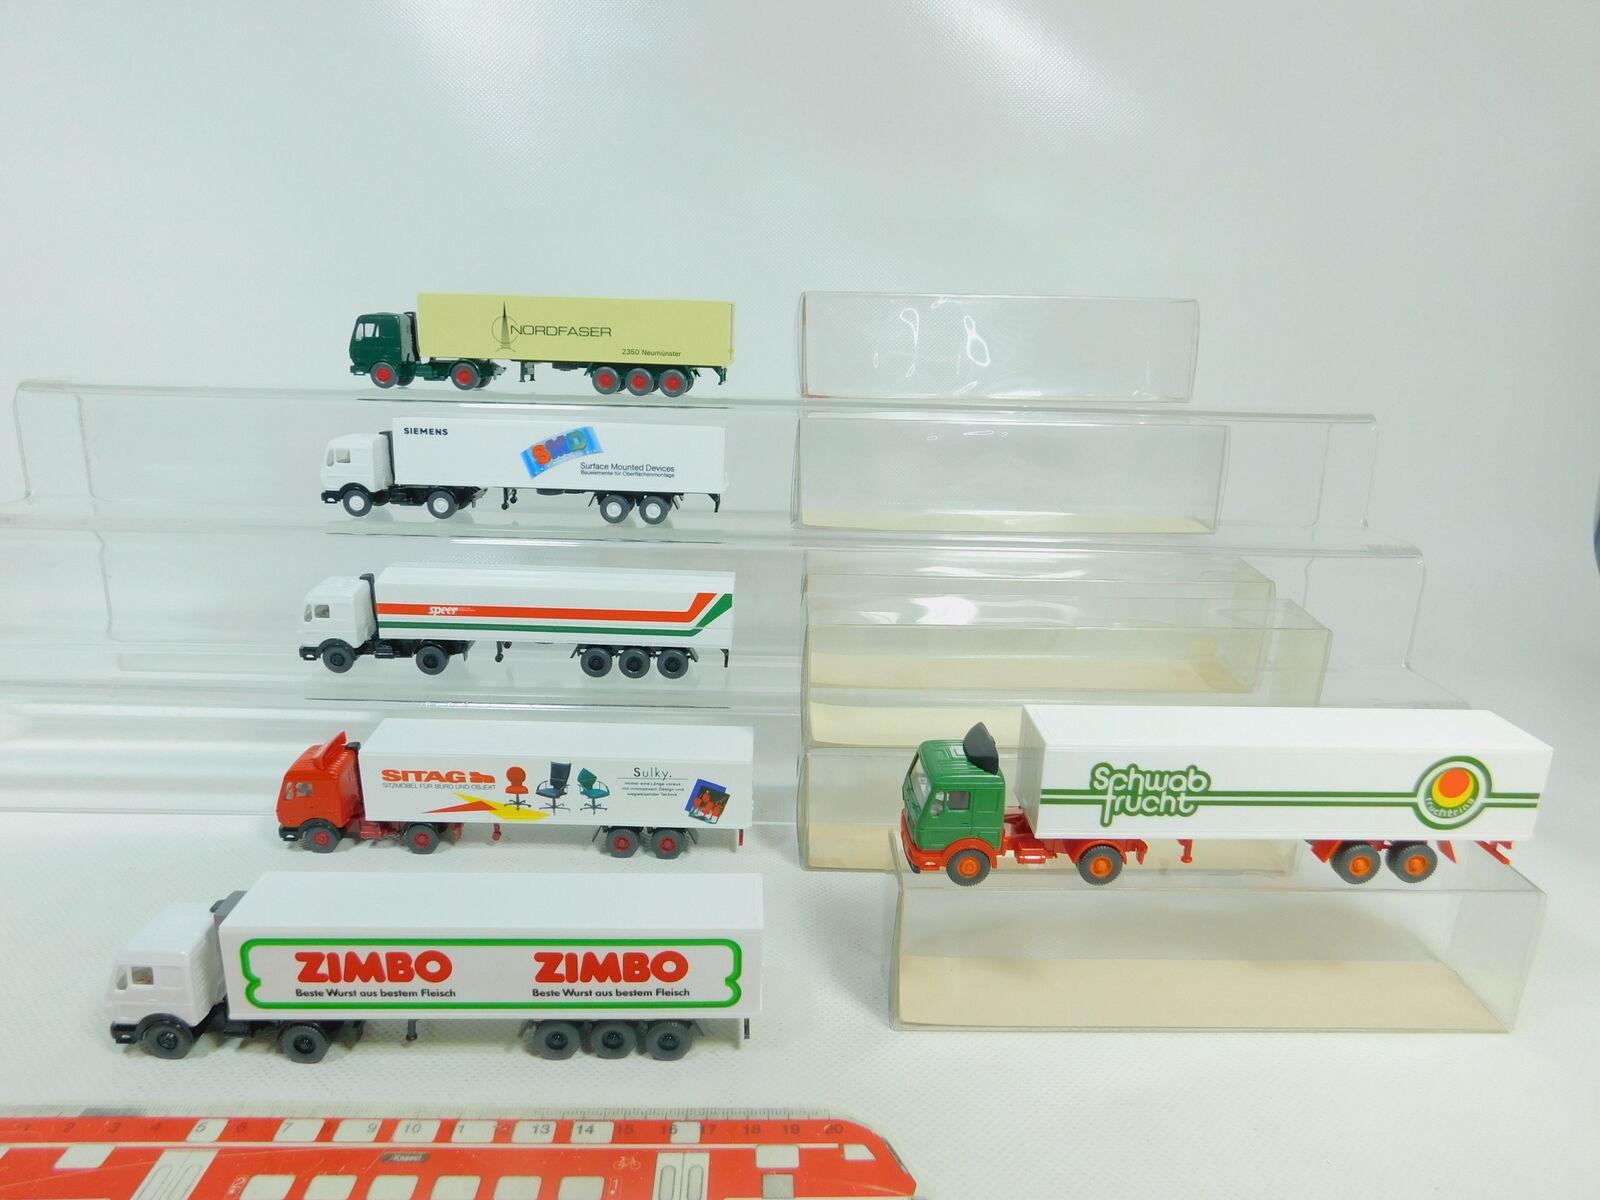 BO655-1 x Wiking H0   1 87 Car Car Car MB  515 Spear +542 Sitag etc. +543 Zimbo ,S.G c951b5